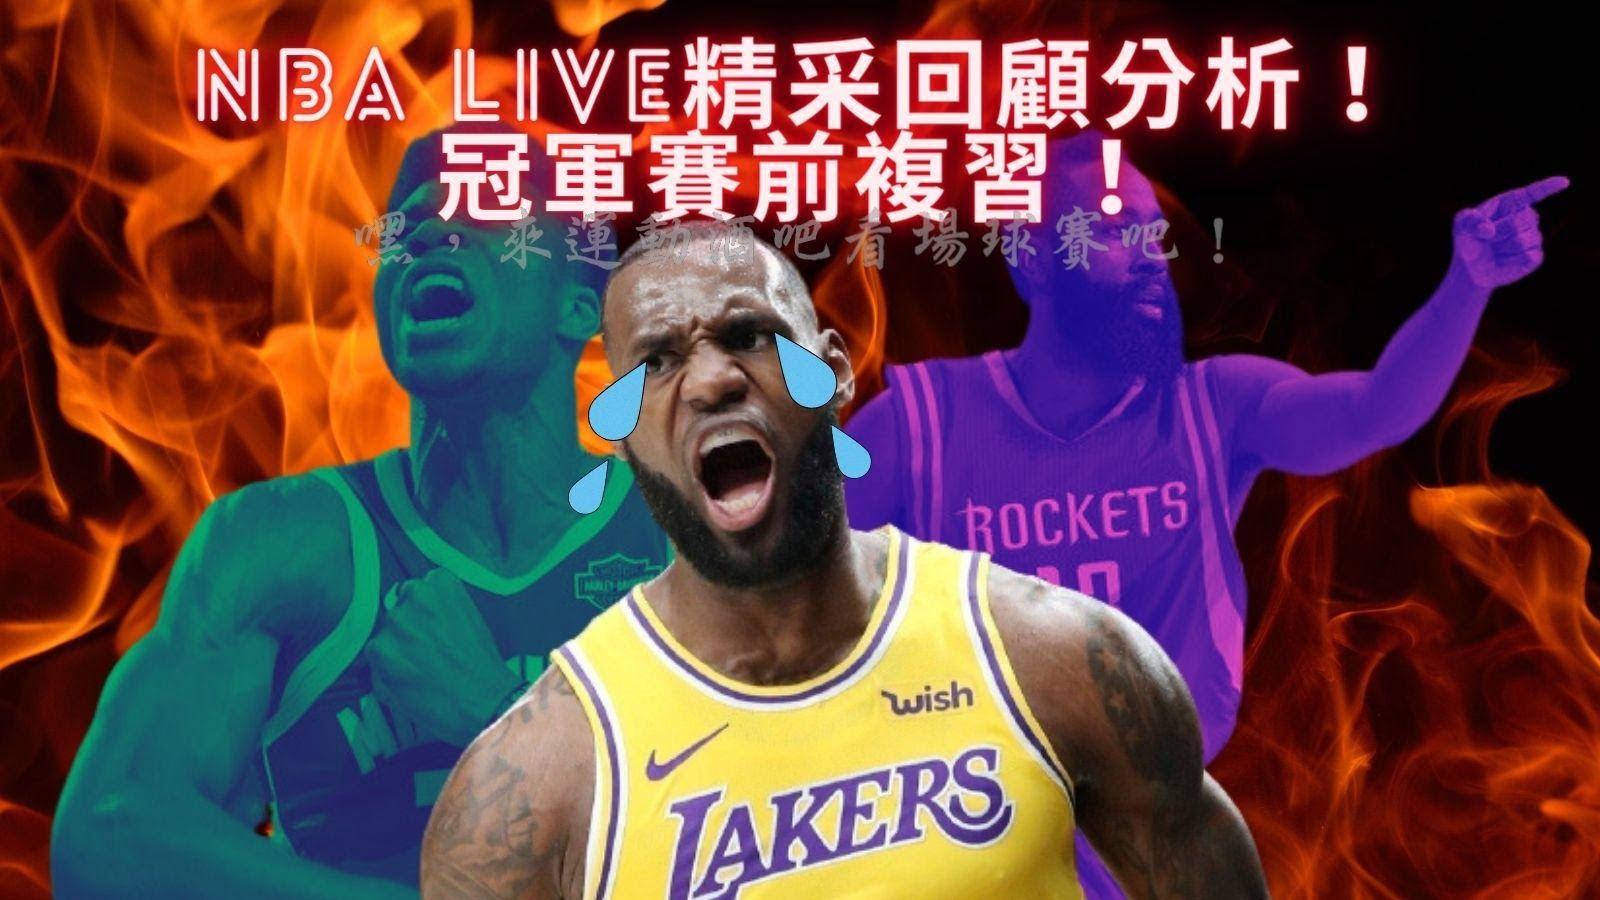 NBA LIVE精采回顧分析!冠軍賽前複習!